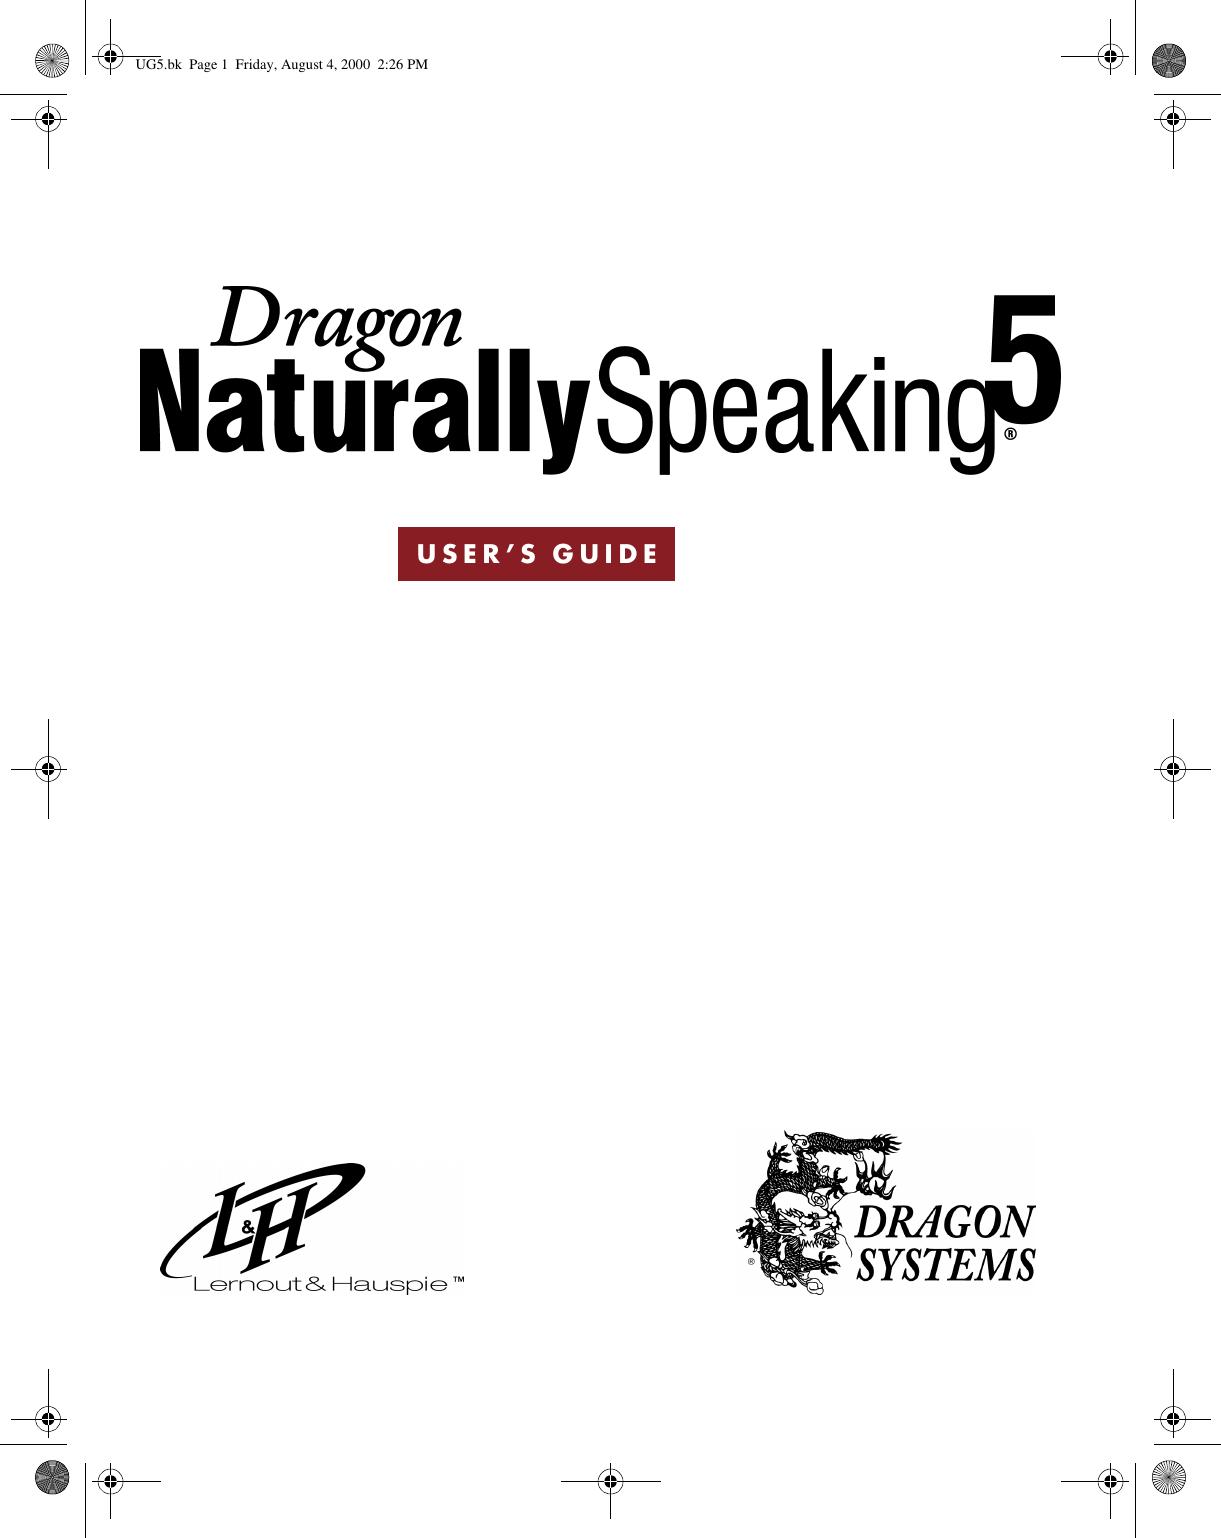 Sony ICD SX46VTP Dragon NaturallySpeaking 5 User's Guide